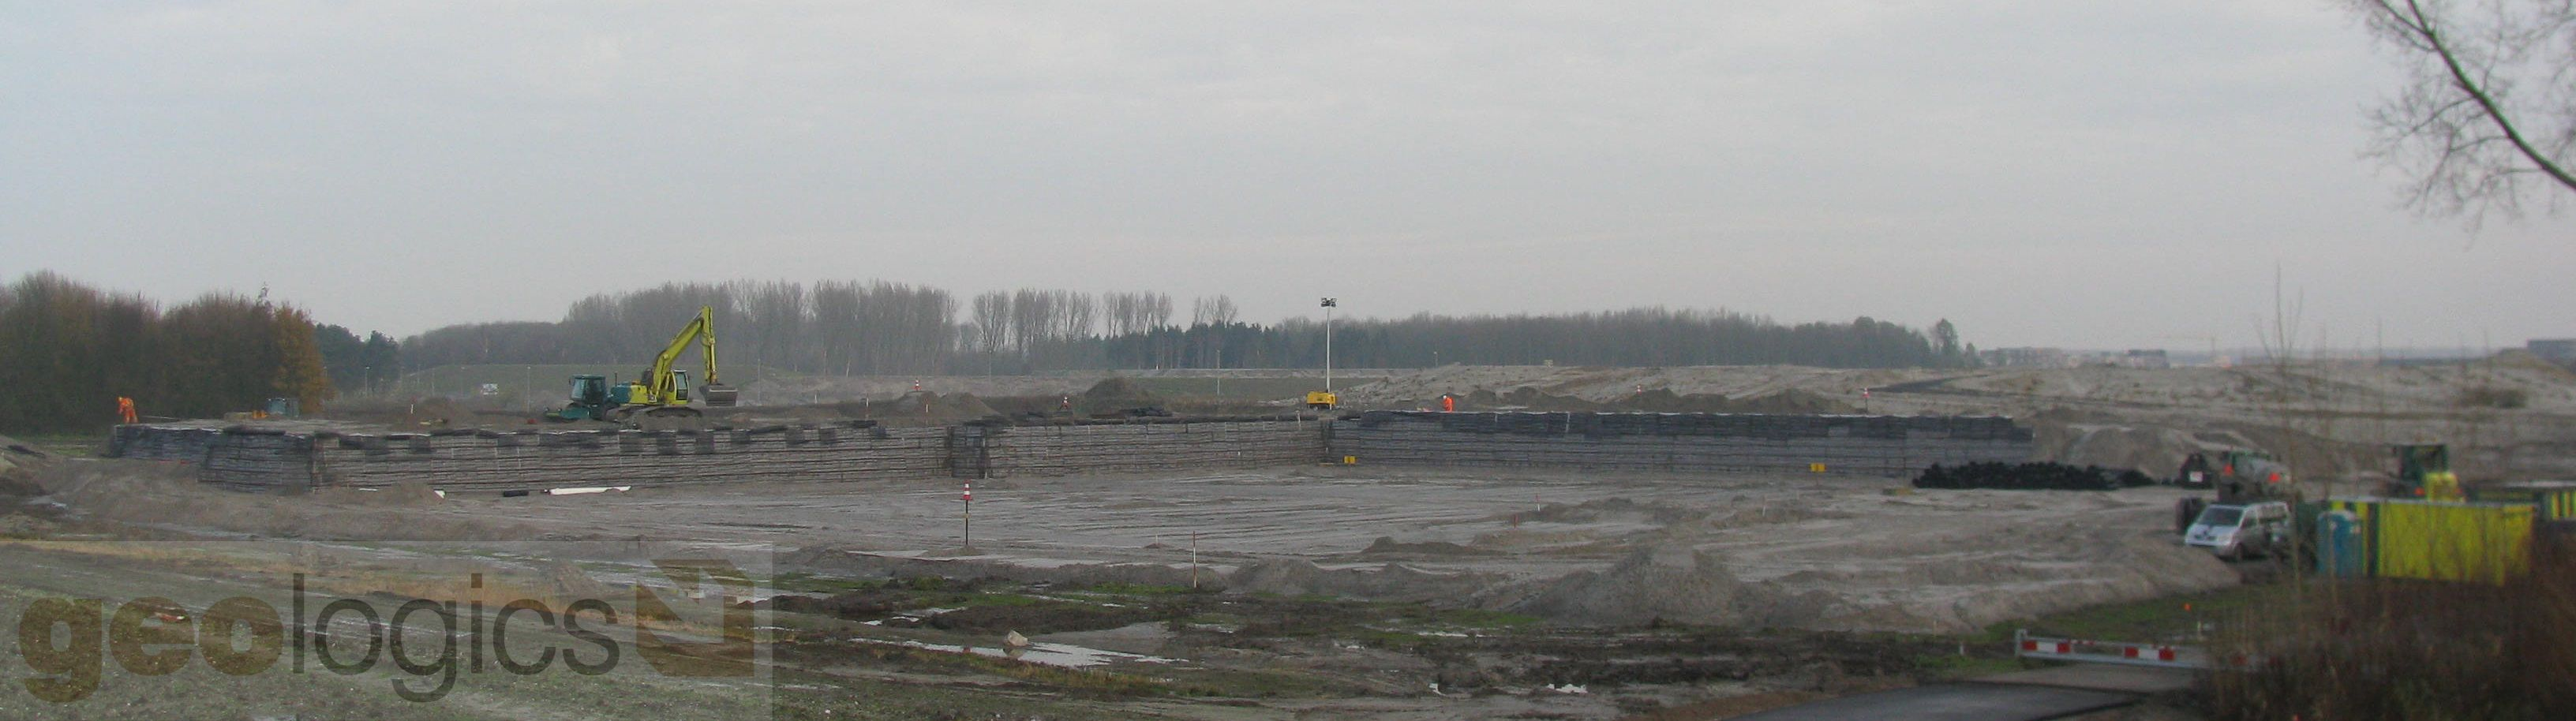 Gewapende grond CSMART Carnival Almere